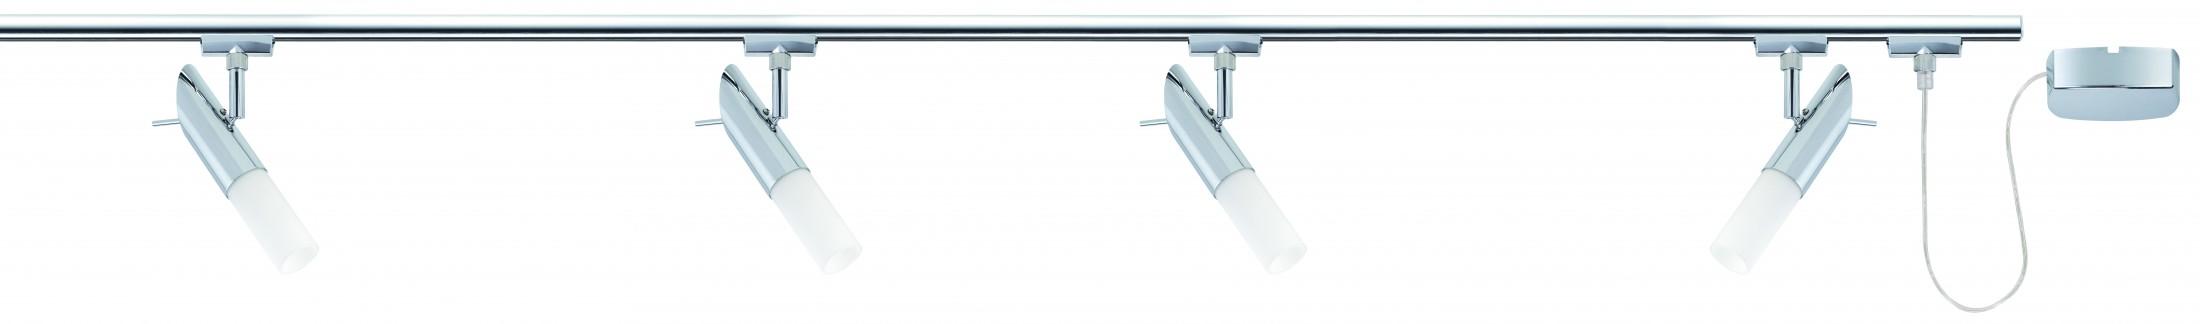 paulmann u rail set urail system set pherus 4x9w. Black Bedroom Furniture Sets. Home Design Ideas